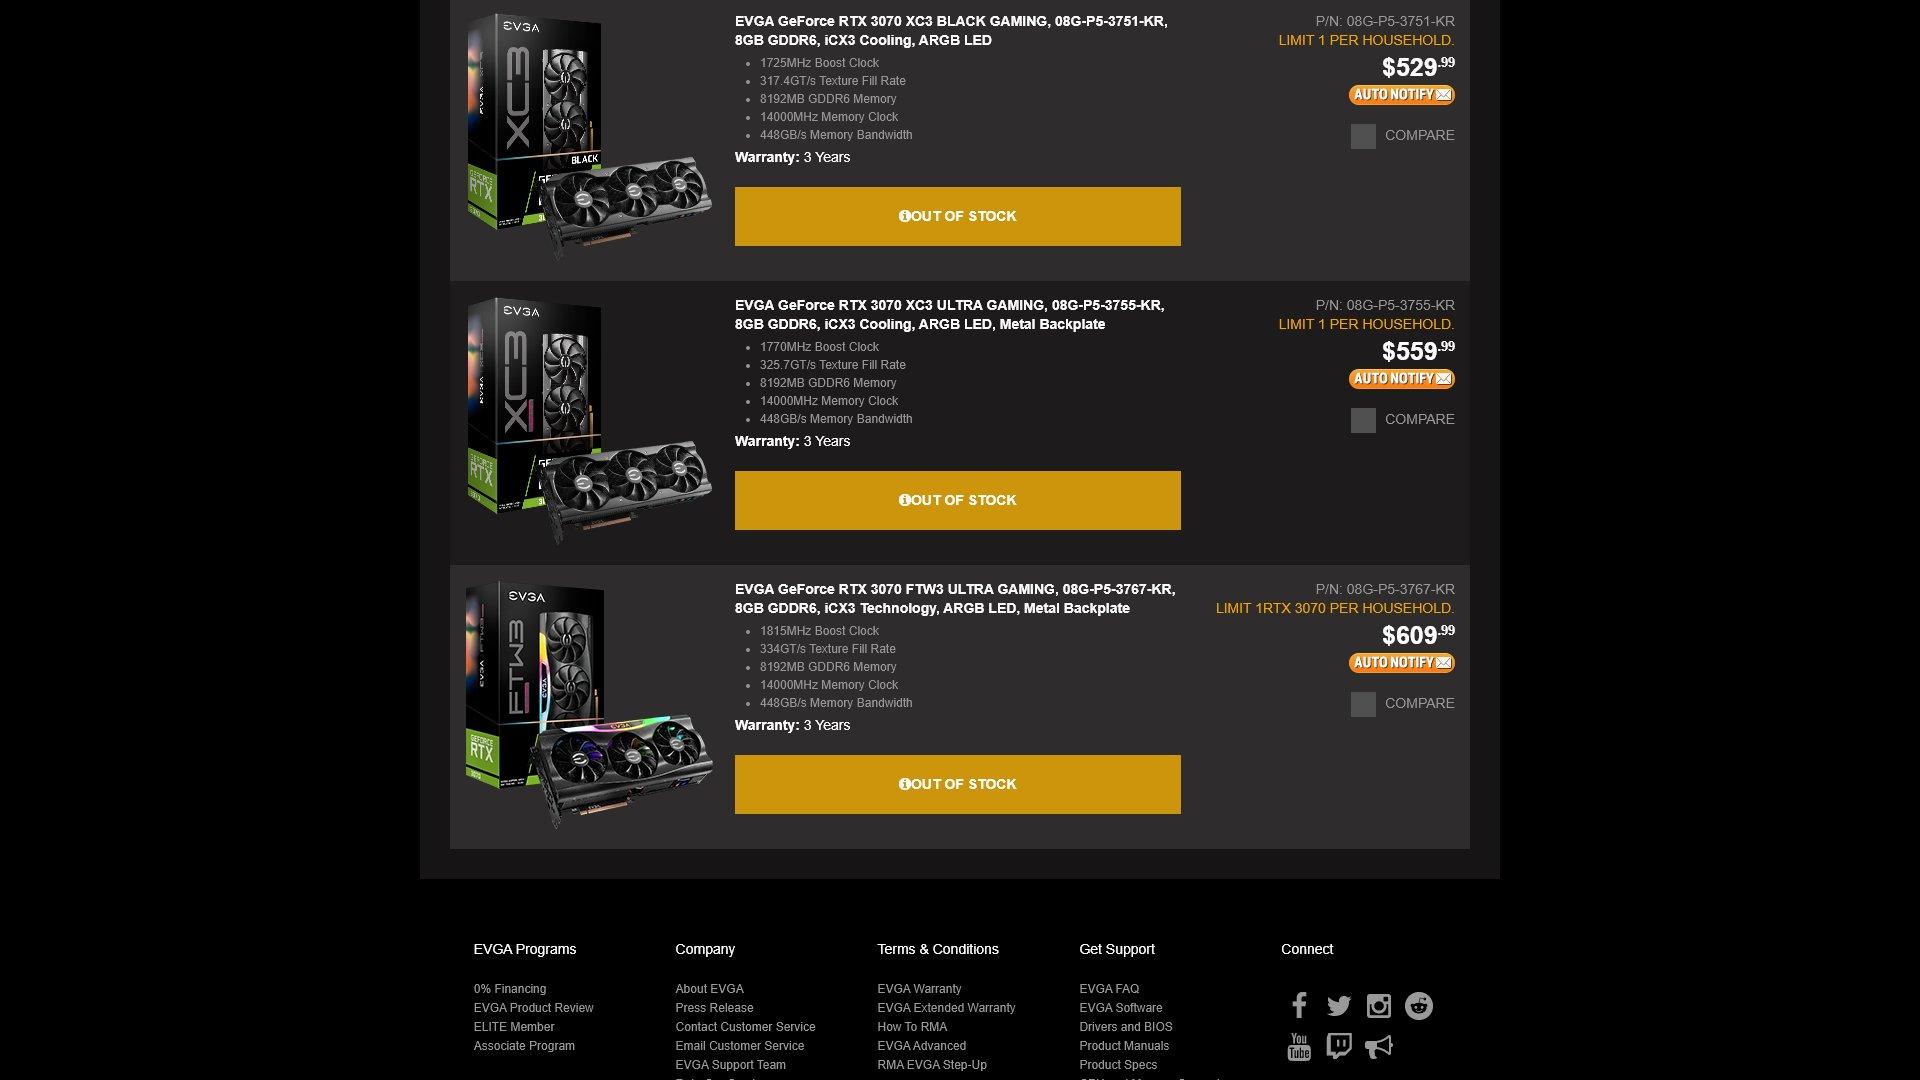 iCX3 Cooling 8GB GDDR6 ARGB LED EVGA GeForce RTX 3070 XC3 Black Gaming 08G-P5-3751-KR